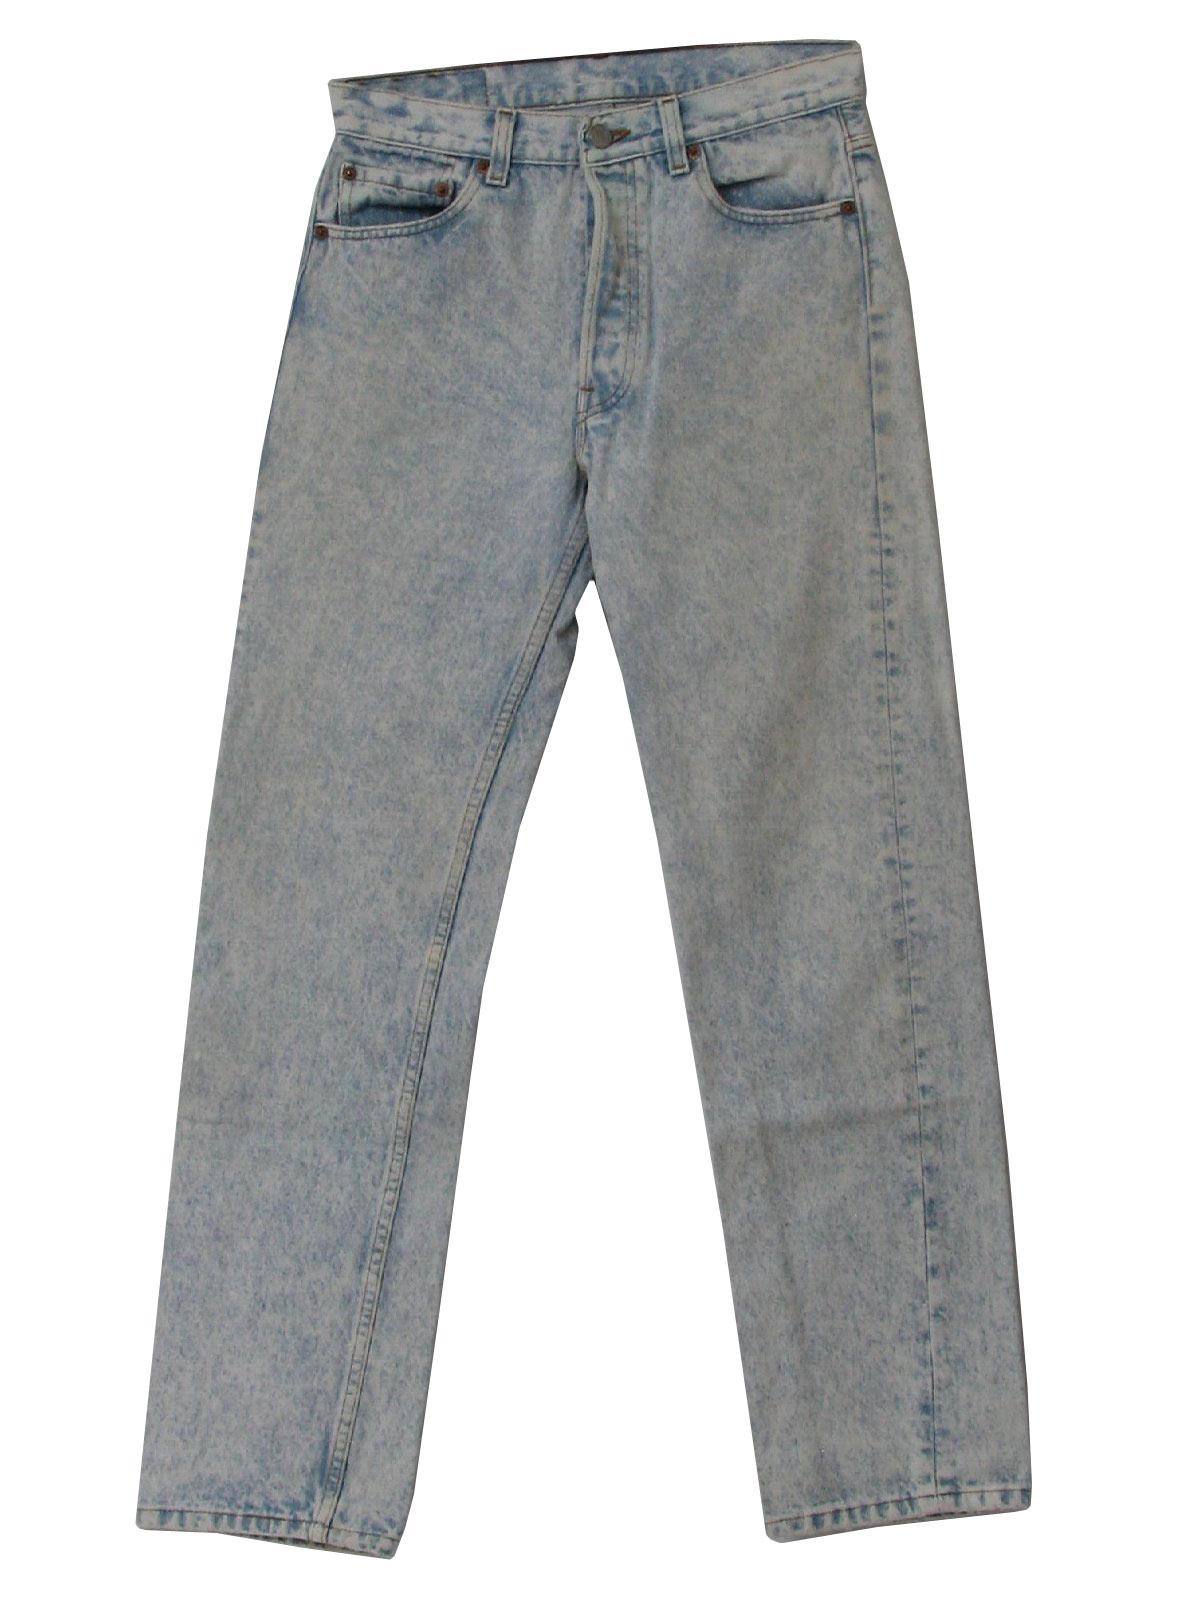 Nineties Vintage Pants Late 80s Or Early 90s Levis Mens